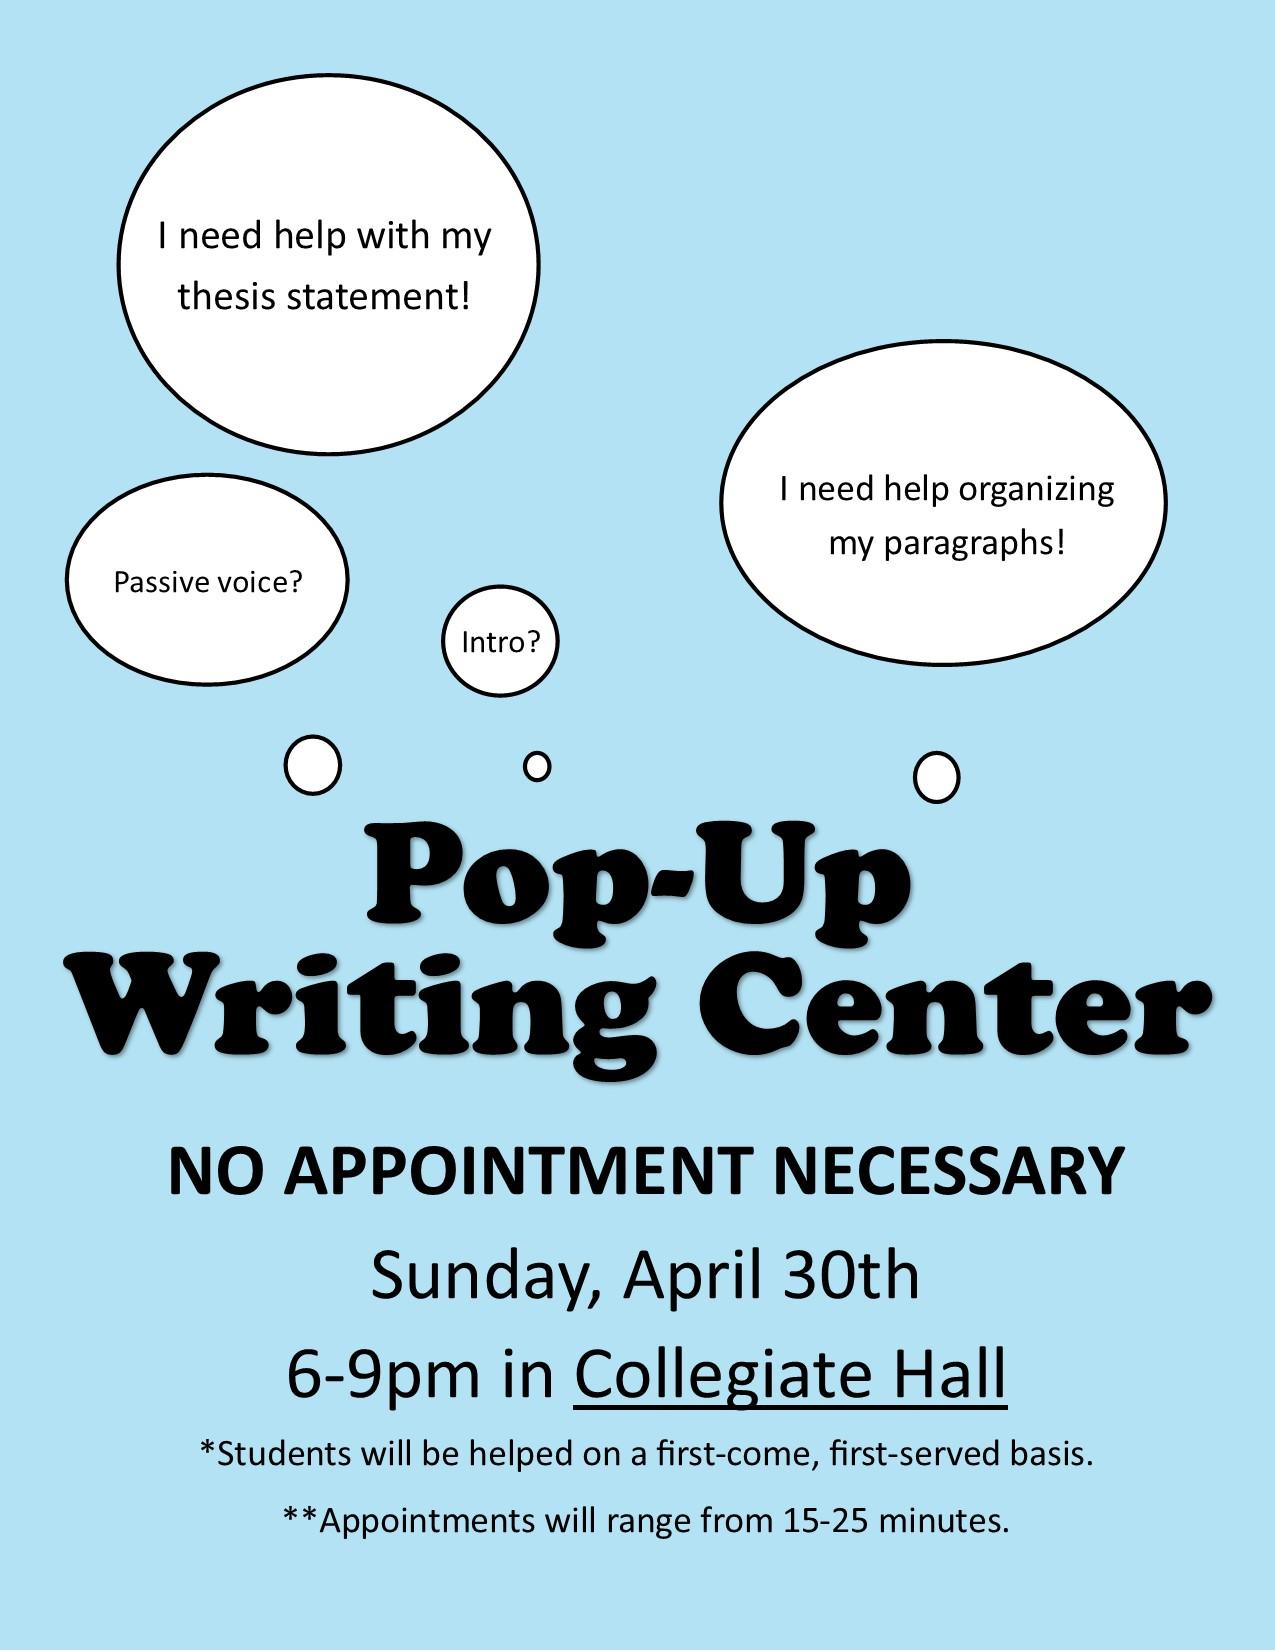 University writing center send in essay